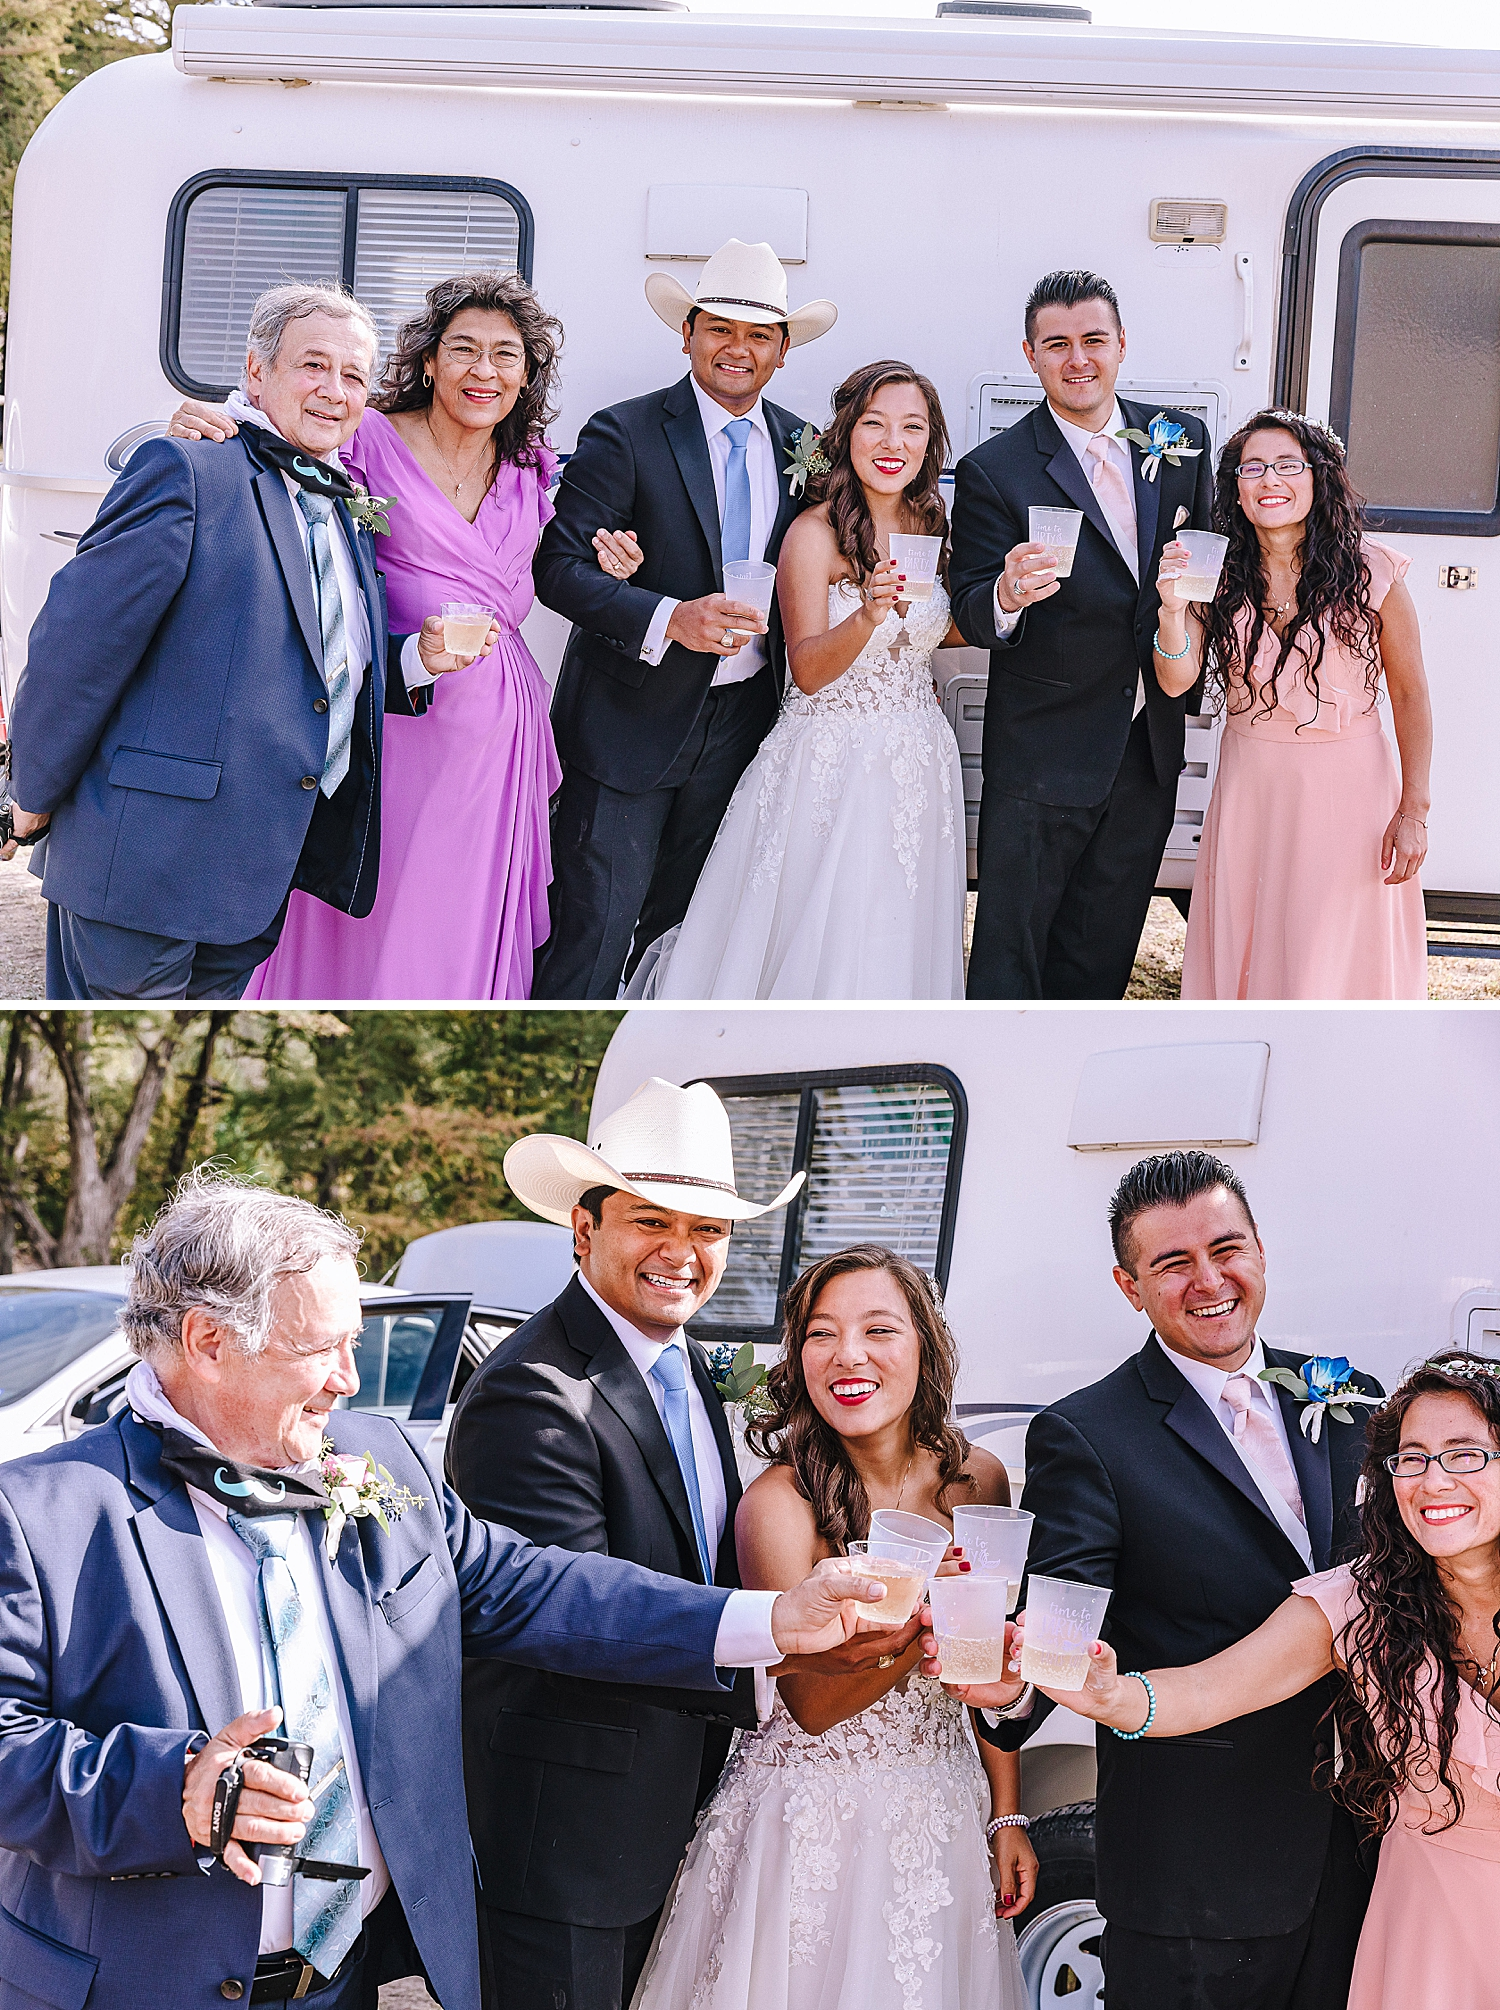 Bandera-Texas-Wedding-Photographer-Bride-Groom-on-Horses-Carly-Barton-Photography_0060.jpg